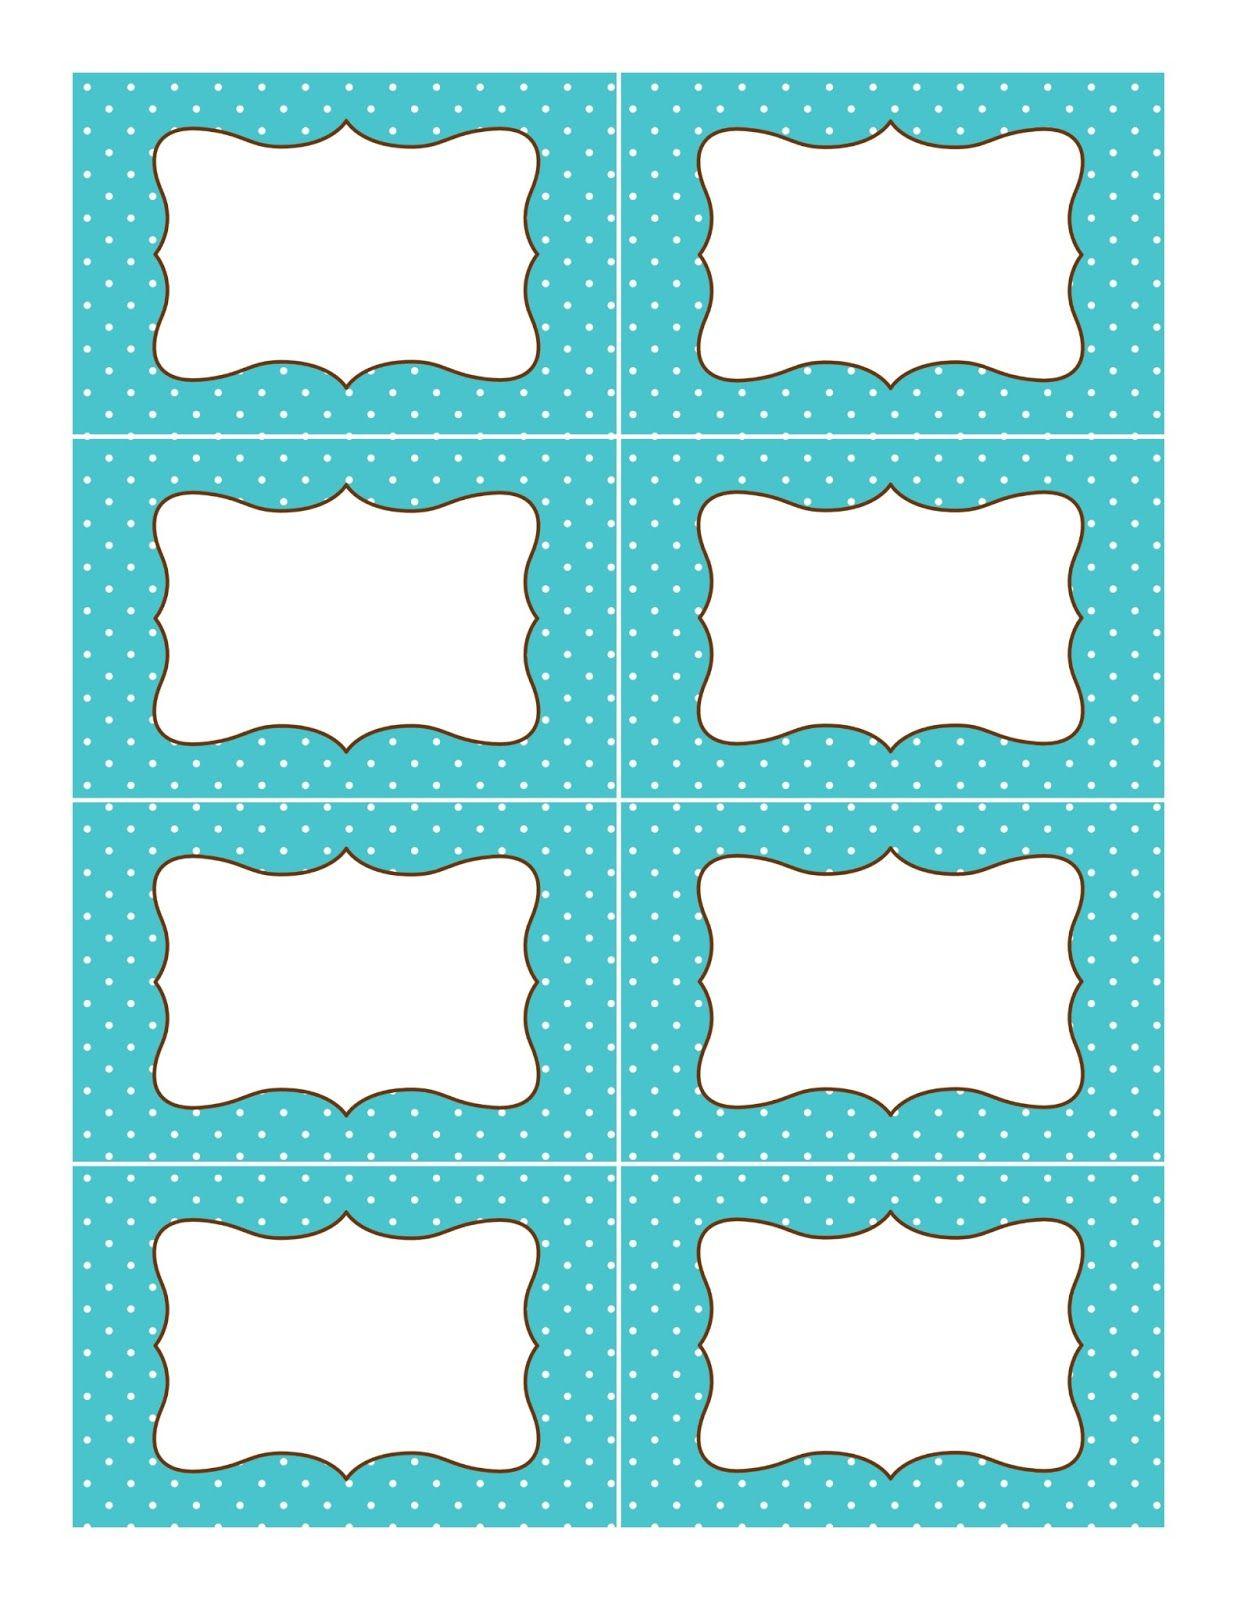 Pincrystal Long On Sweet Bar Buffet | Pinterest | Printable - Free Printable Buffet Food Labels